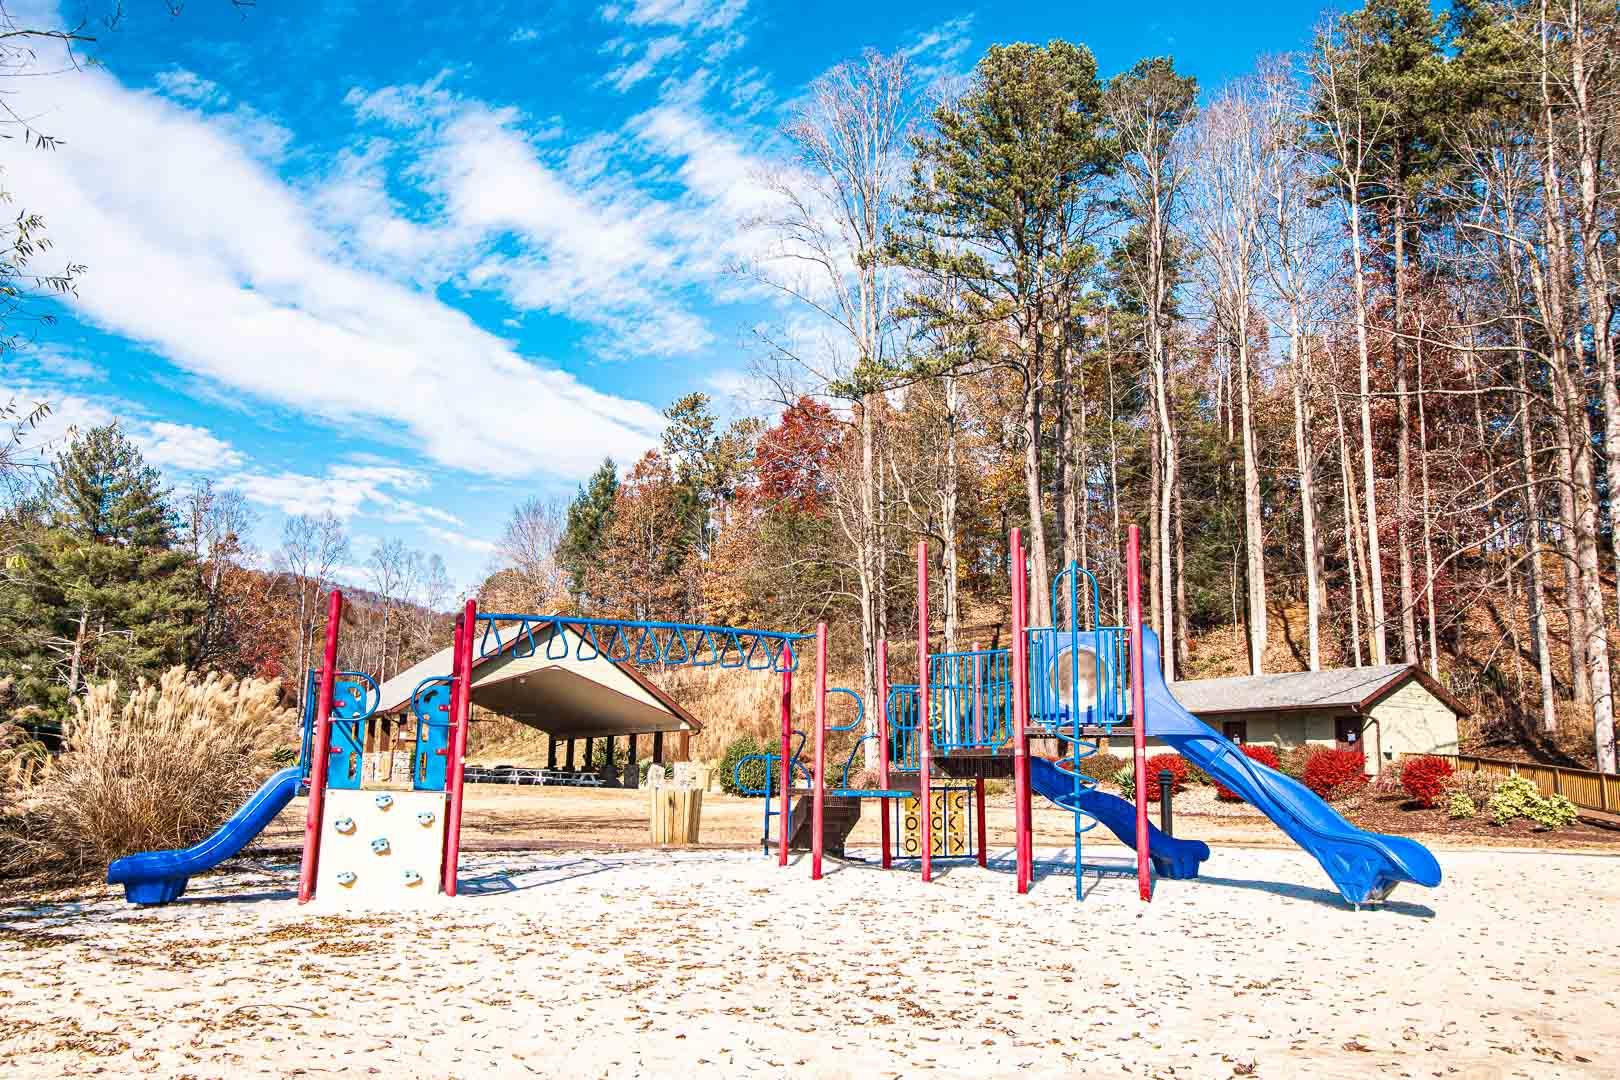 A colorful children's playground at VRI's Mountain Loft Resort in North Carolina.